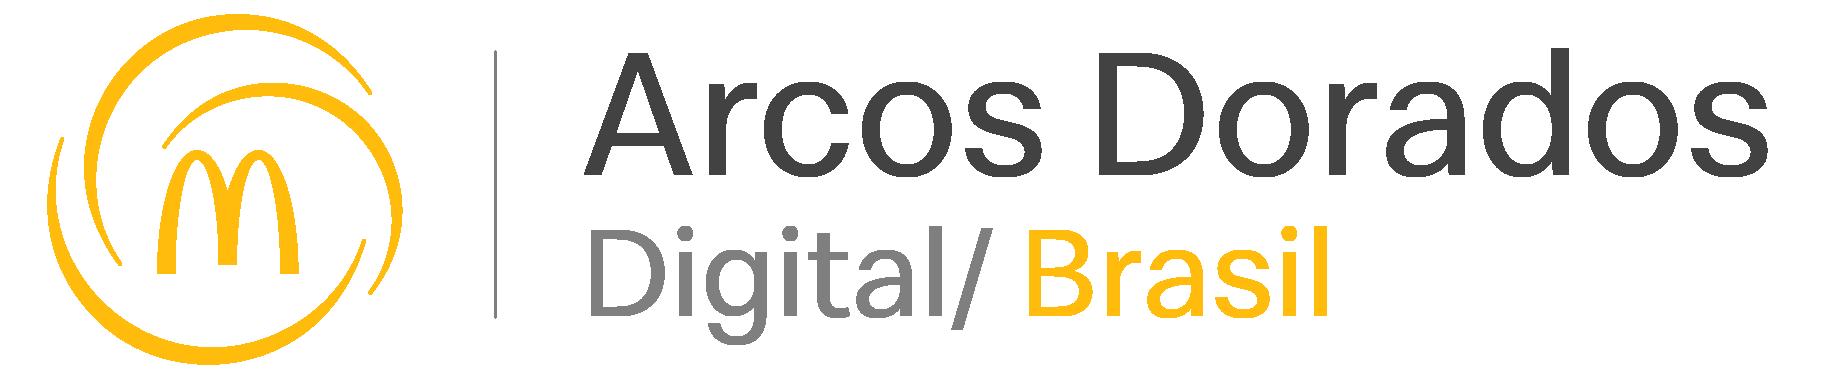 Arcos Dorados Digital – Brasil